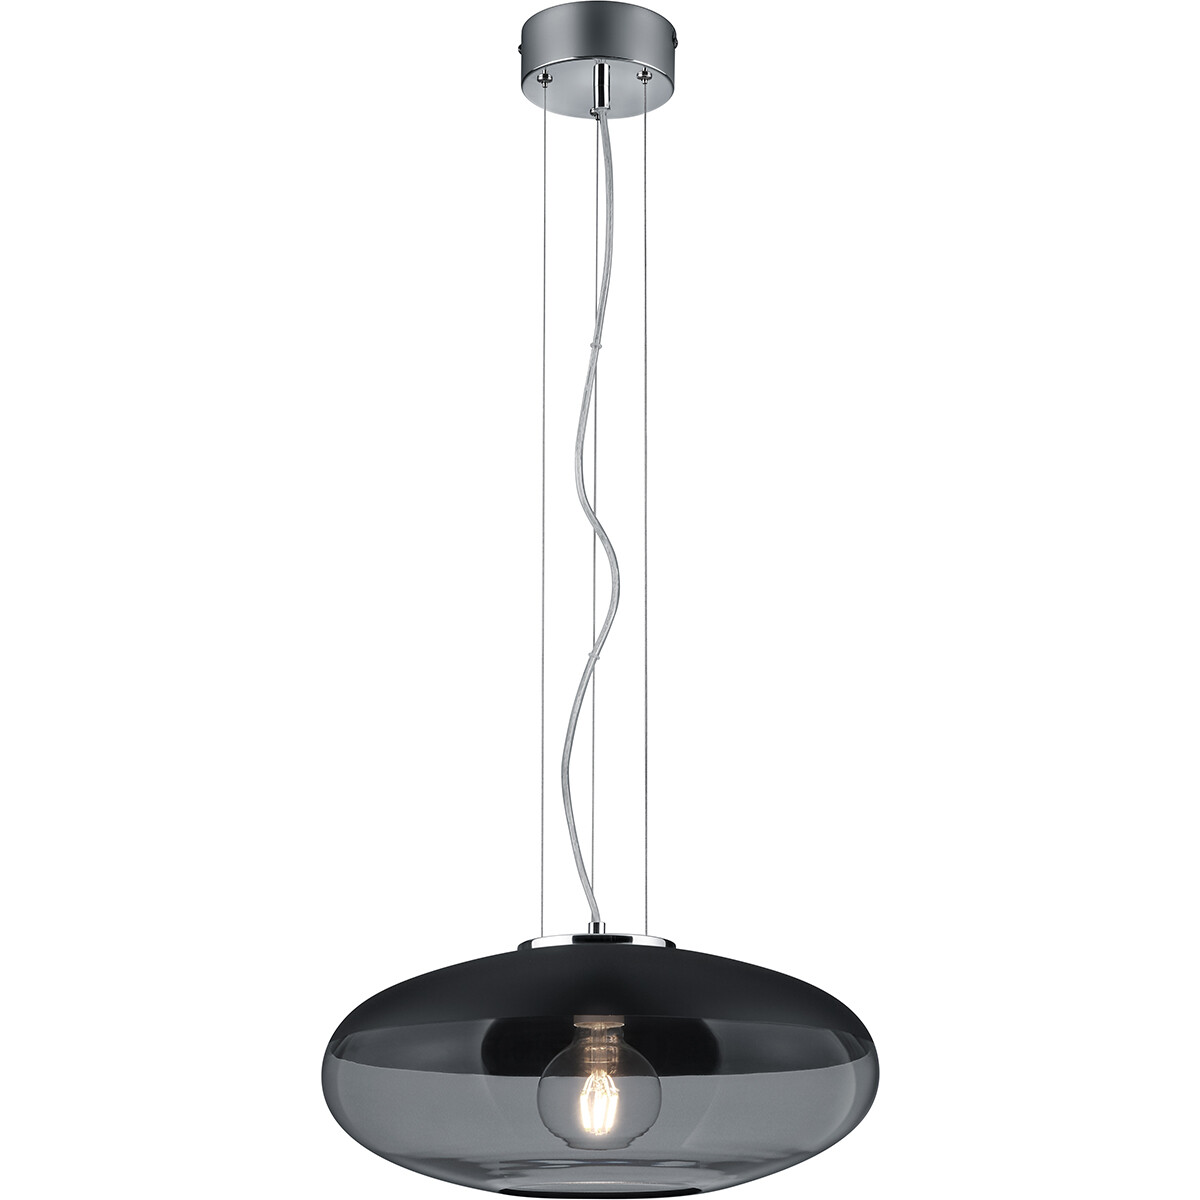 LED Hanglamp - Trion Portony - E27 Fitting - Rond - Mat Zwart - Aluminium